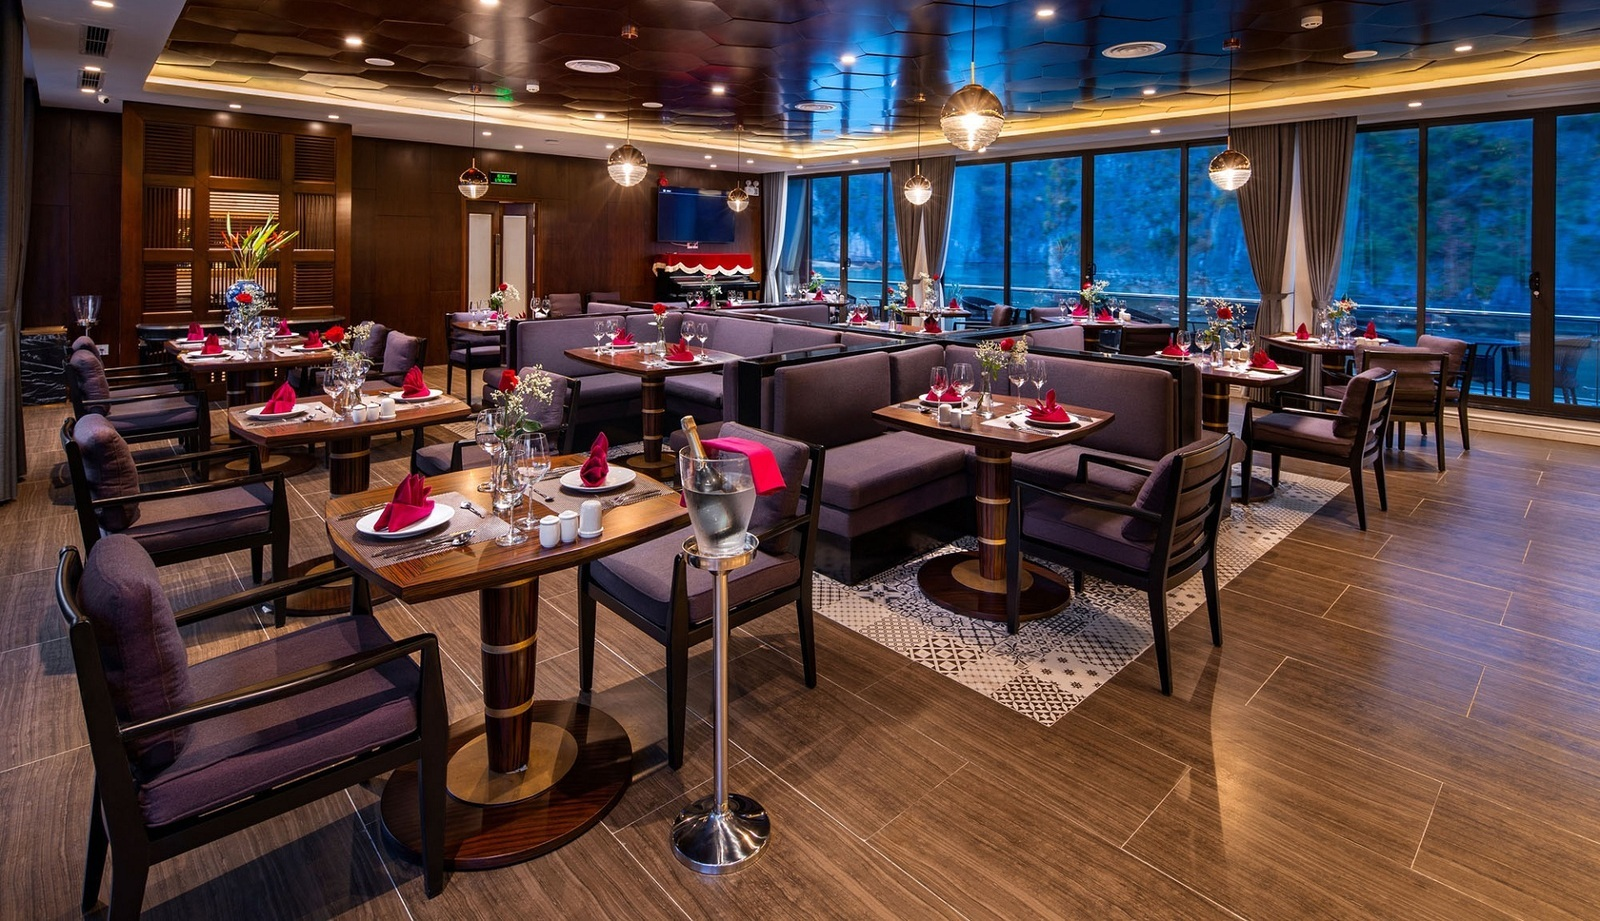 Stellar-Restaurant-6397-1588763028.jpg